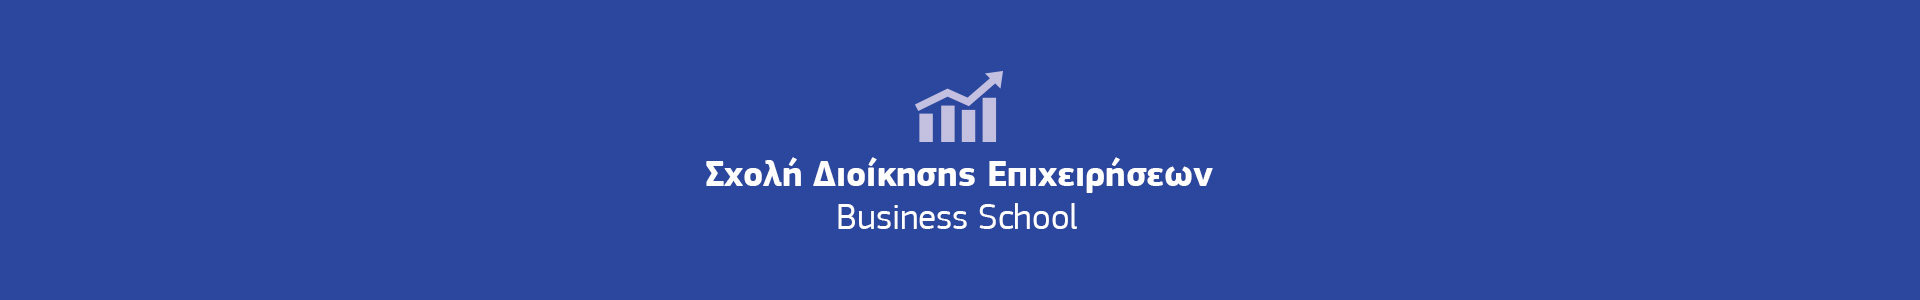 1920x300_business-school